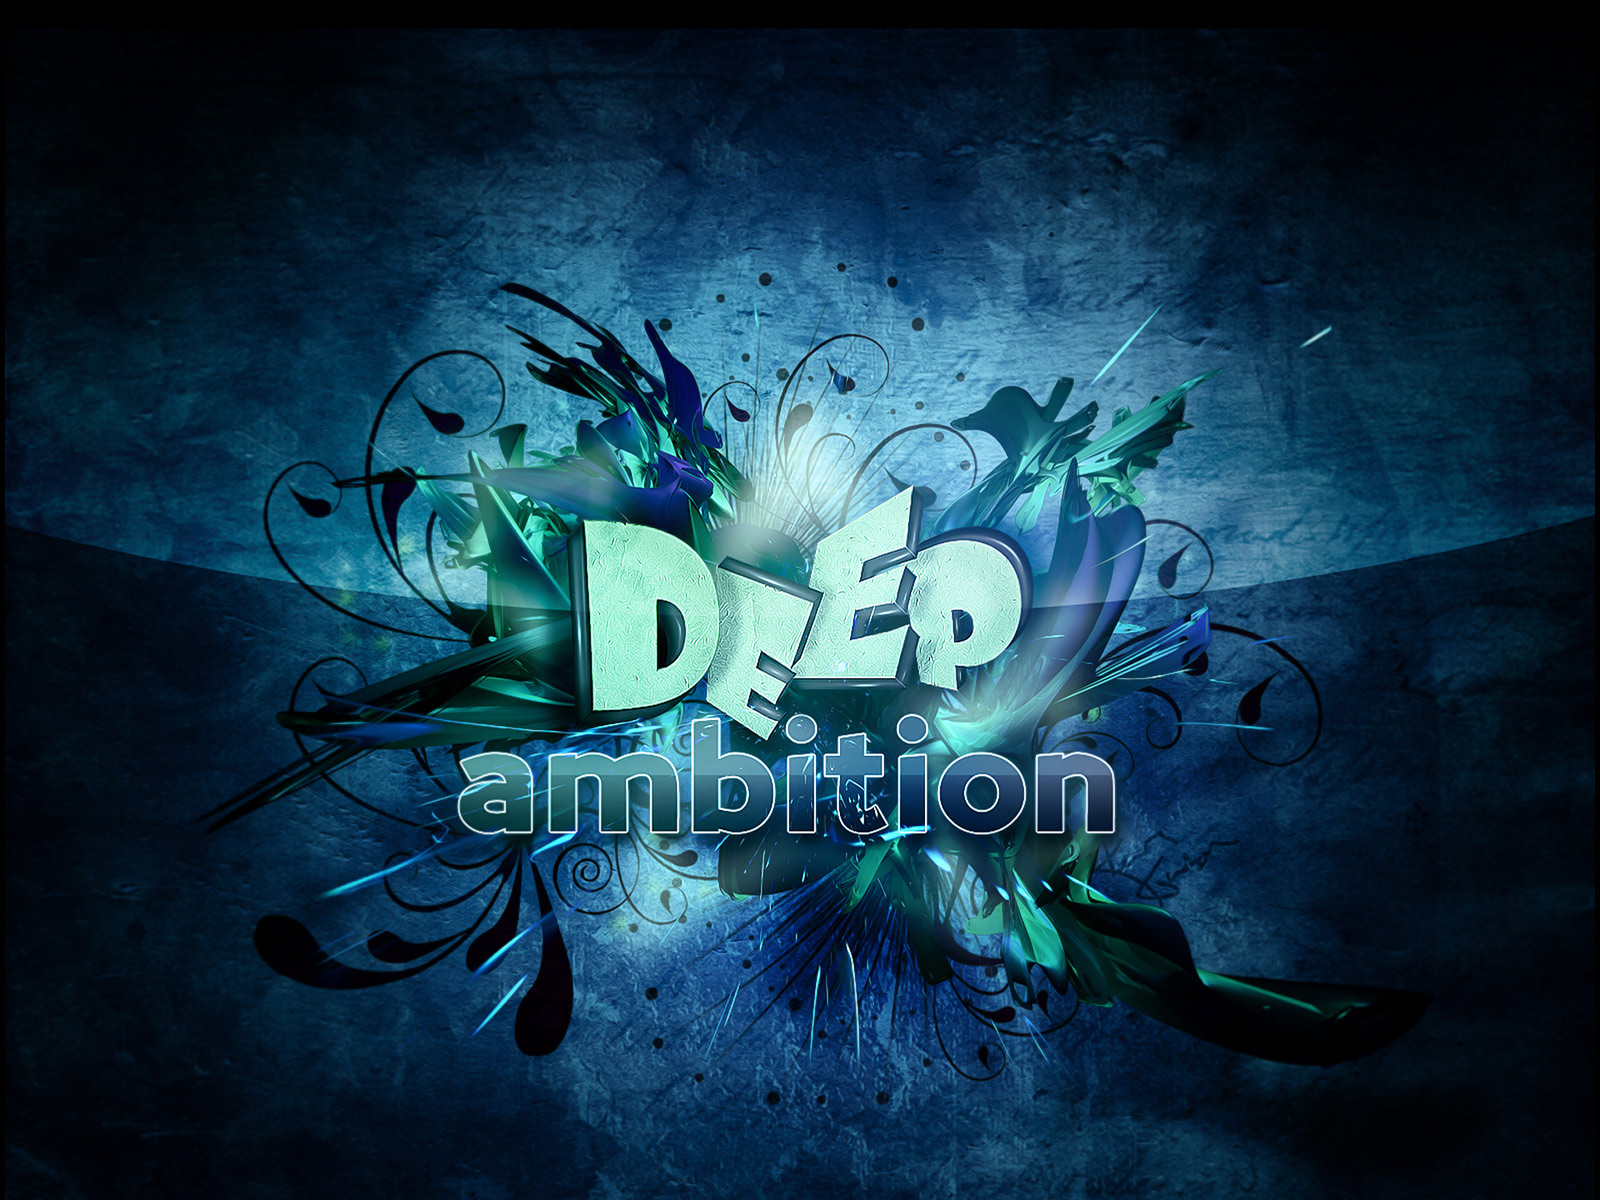 http://1.bp.blogspot.com/-TR_KIrJXKqs/TyIqy8t_QkI/AAAAAAAABik/3DoX6_s2WHE/s1600/Deep_Ambition_3D.jpg